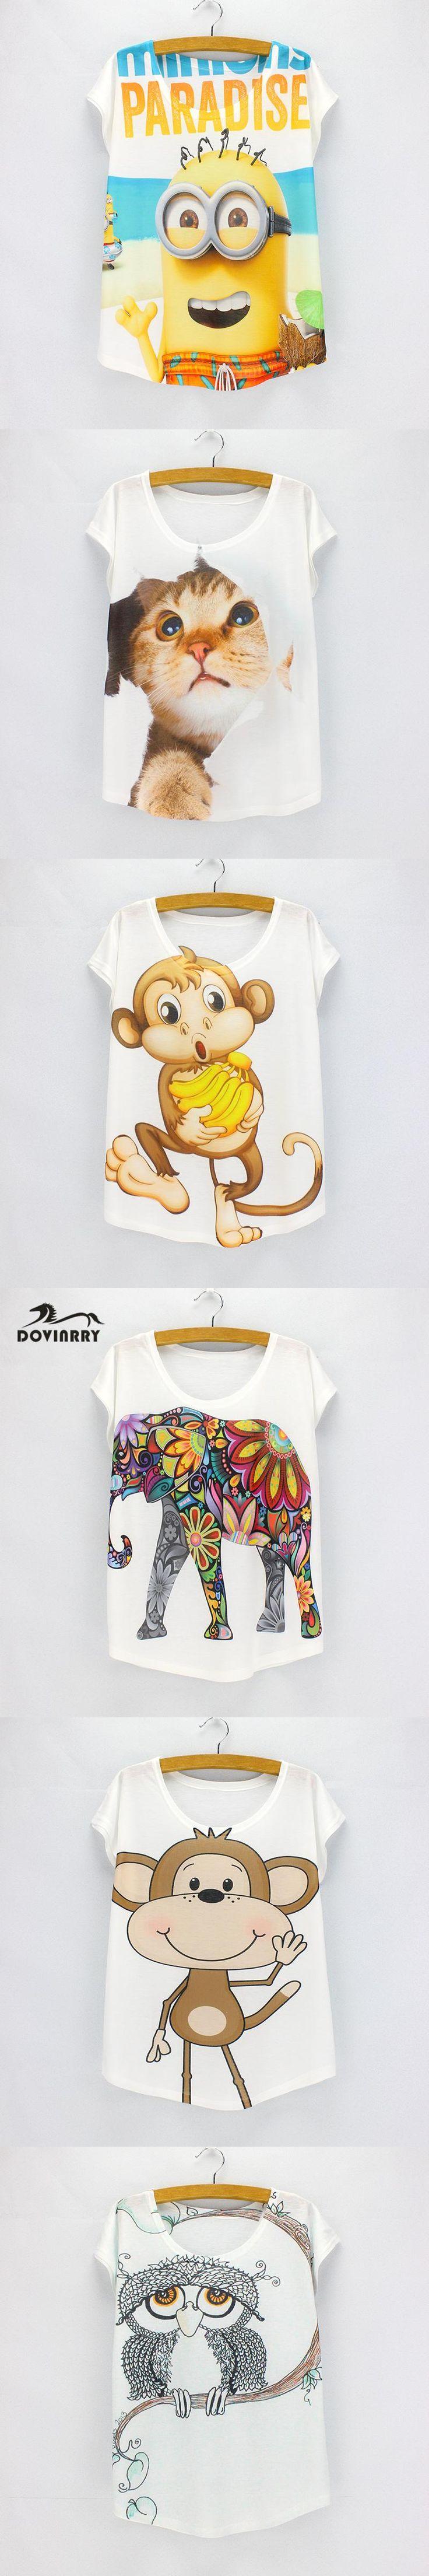 Cartoon Animal Printed T-shirt Women O-Neck Brand Clothing Top Tees Casual Rock T-shirt Female Harajuku Top Cute Cat Tees